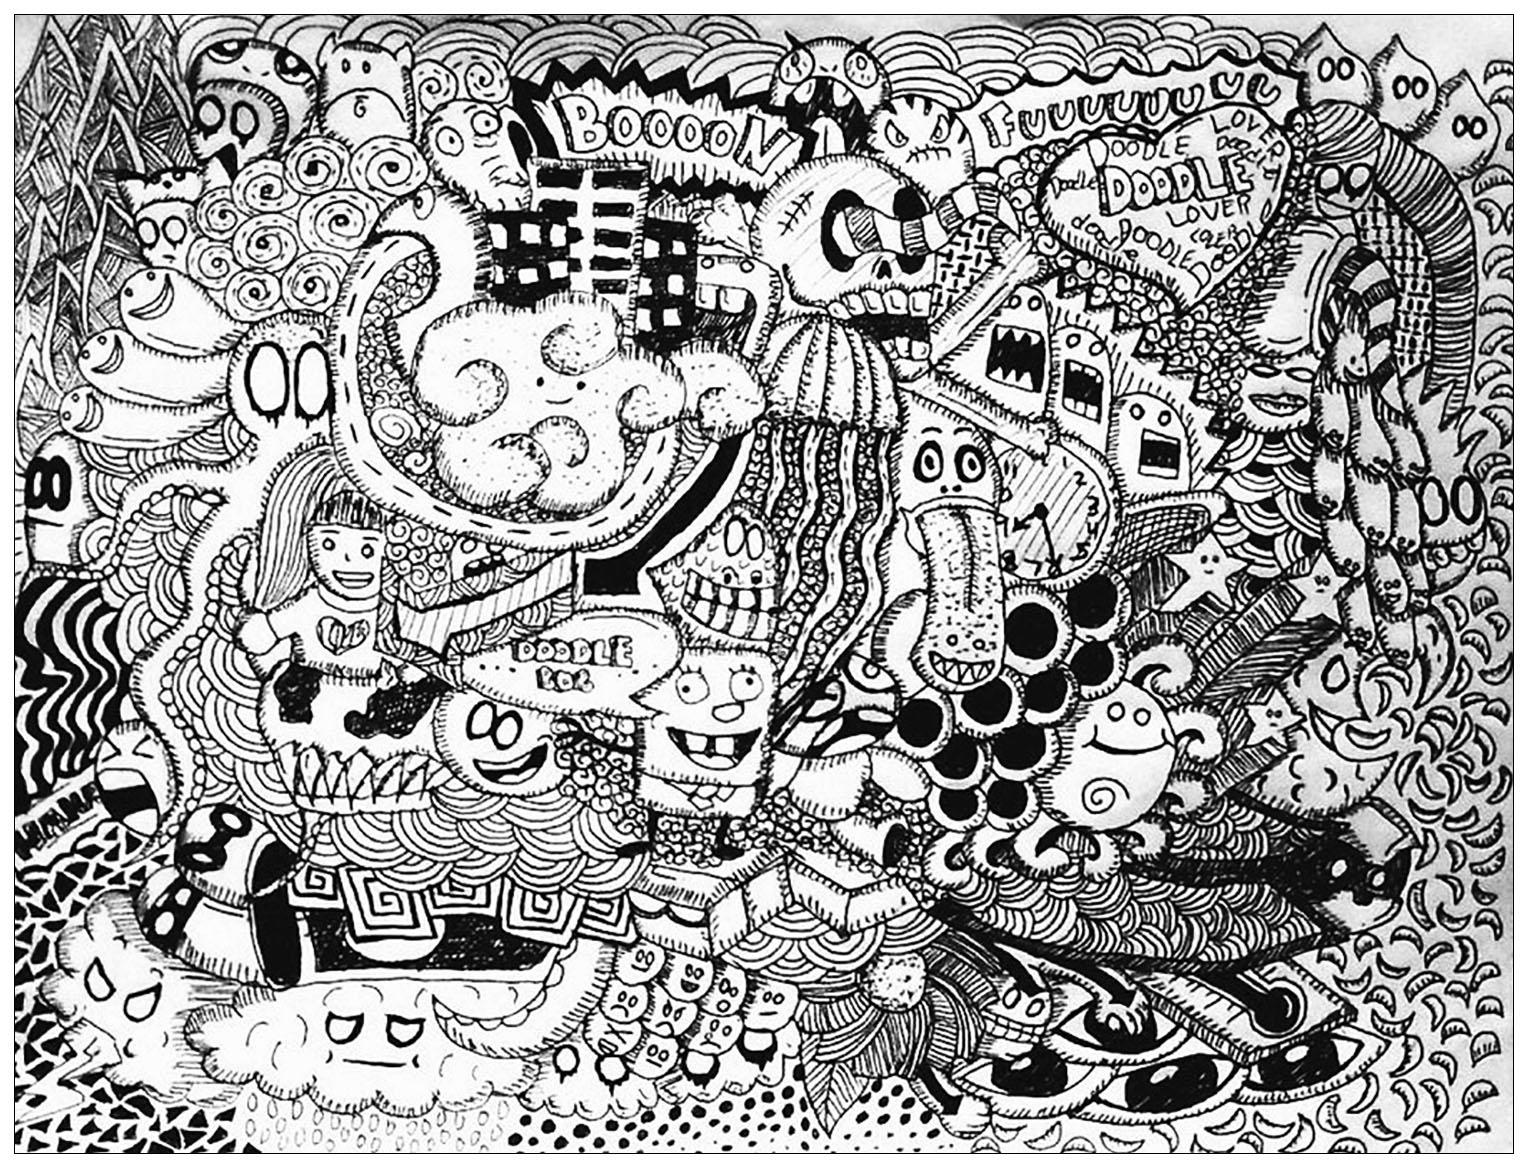 Disegni da colorare per adulti : Doodle art / Doodling - 26